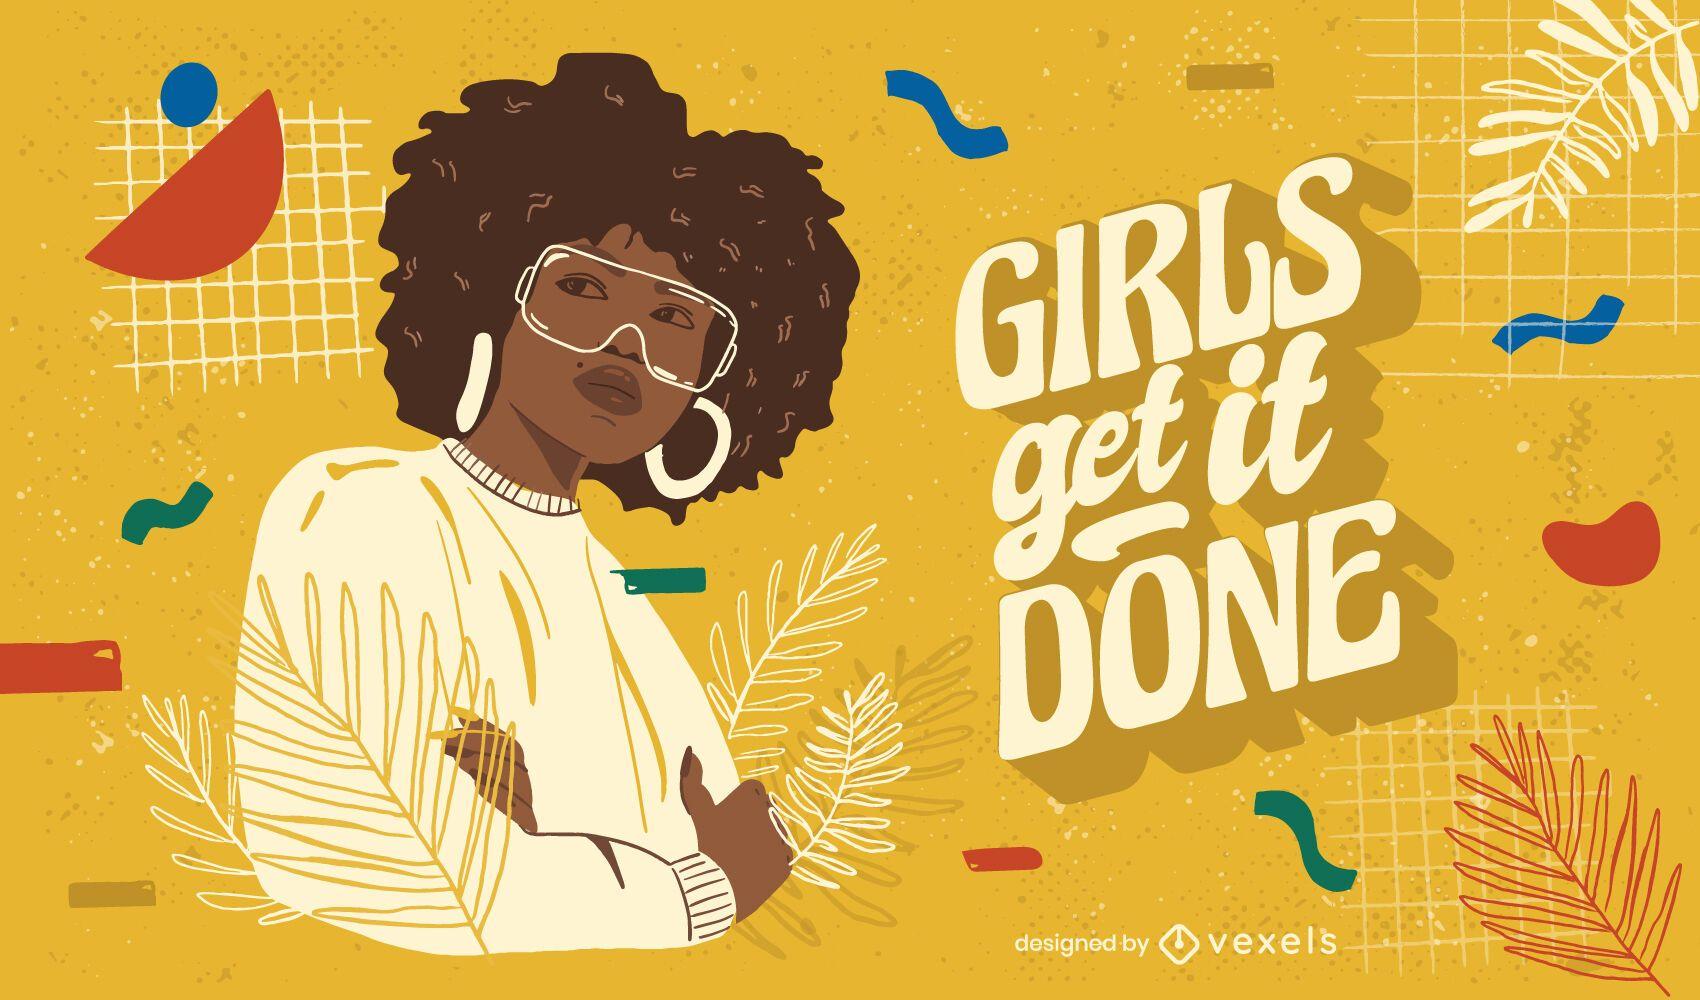 Girls get it done illustration